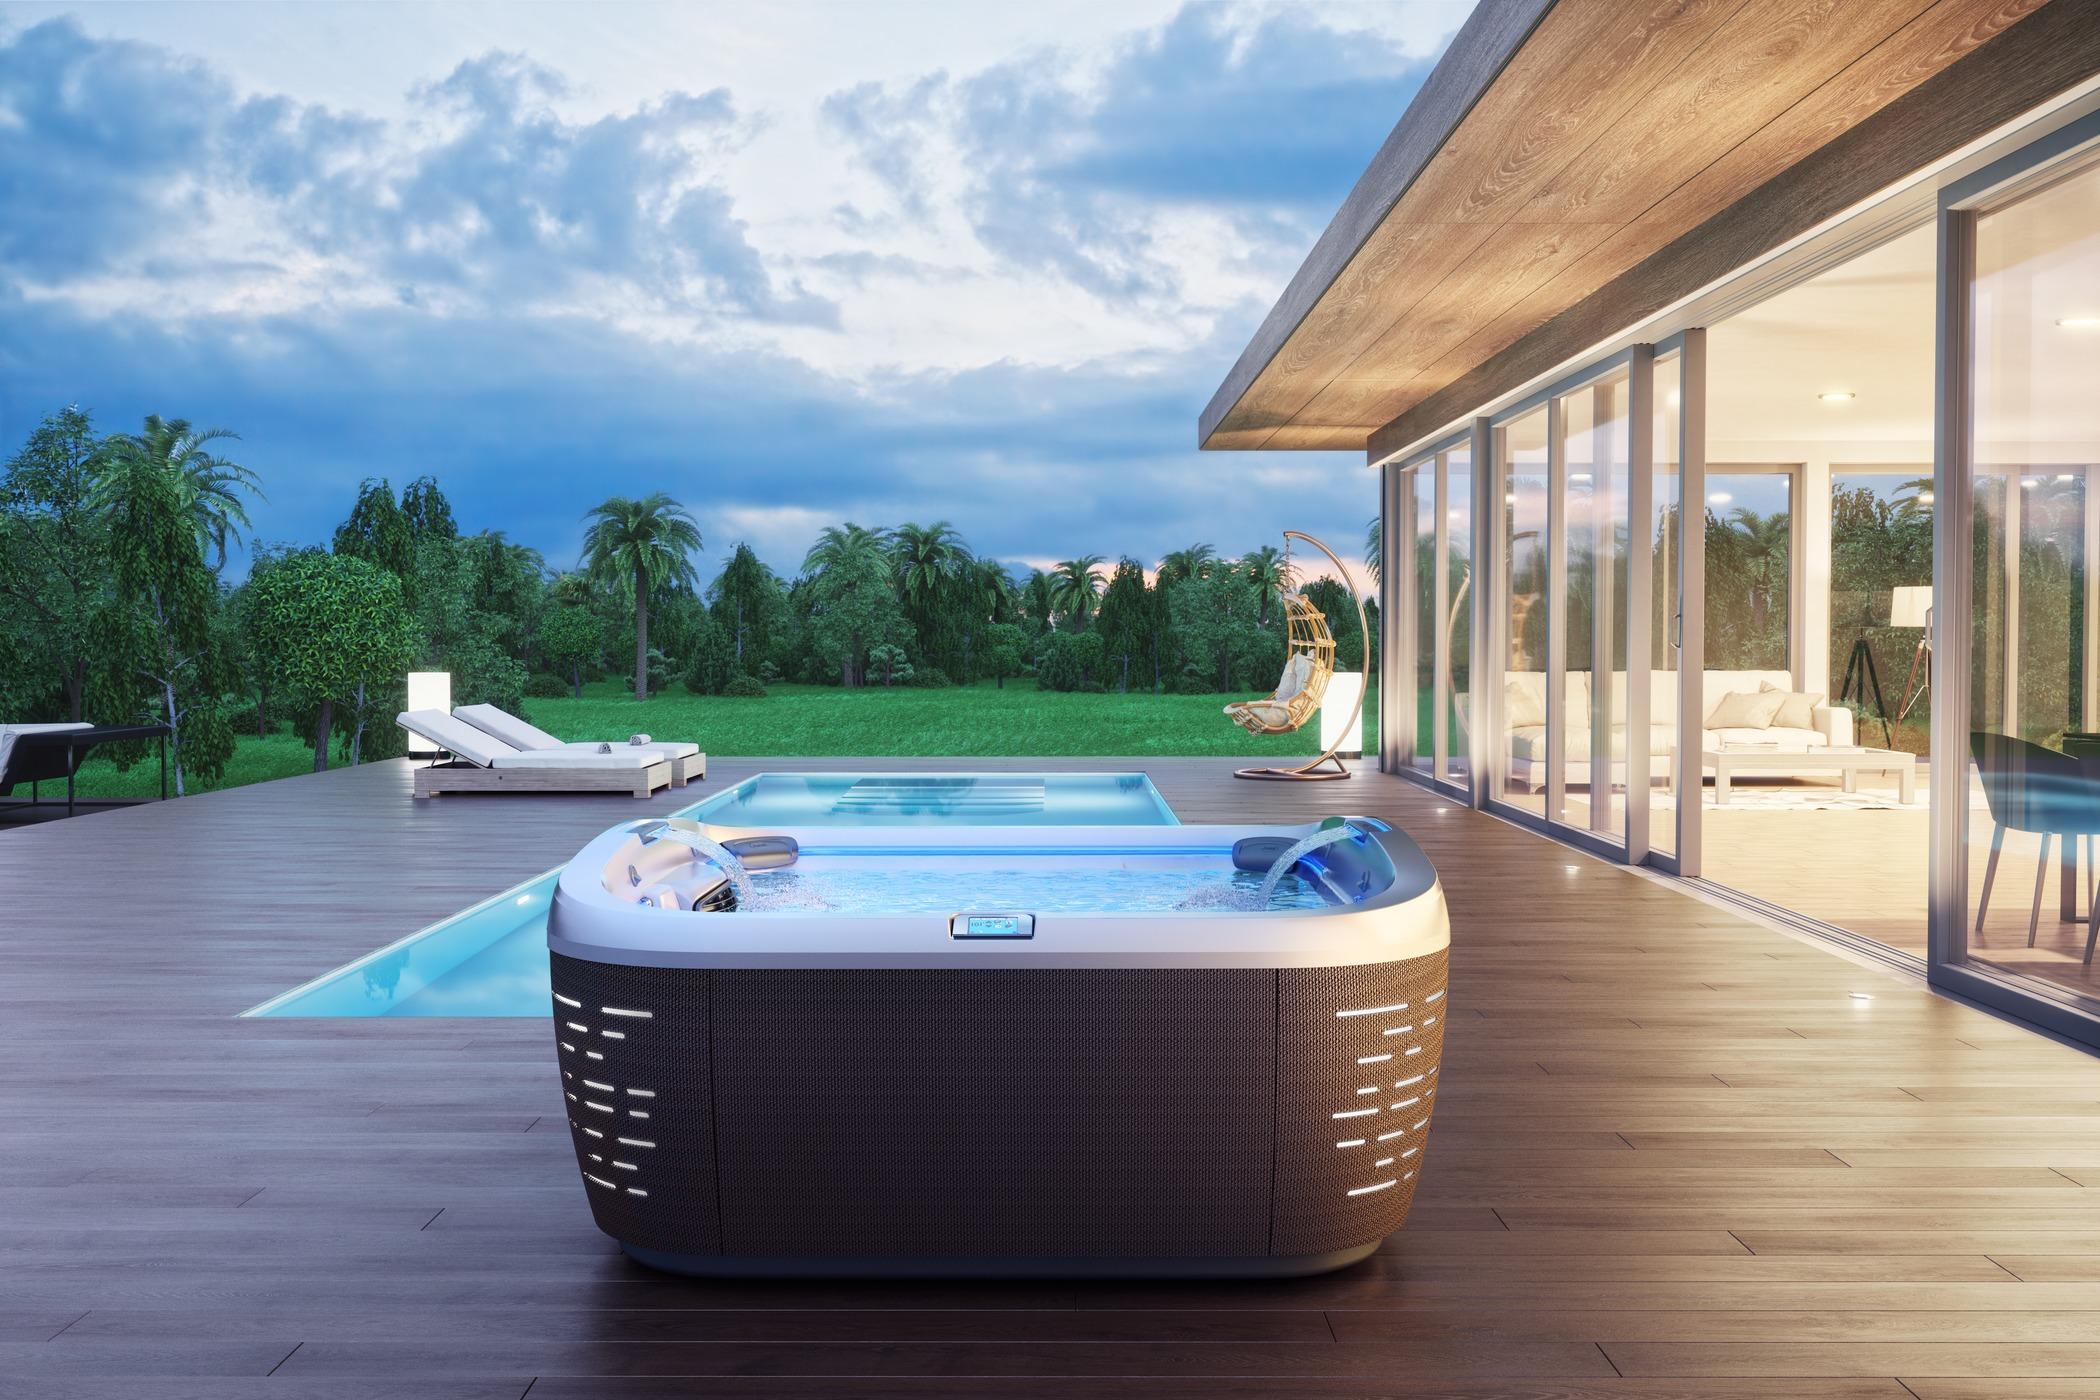 Jacuzzi J-585 Hot Tub Installation in Ocala backard with pool